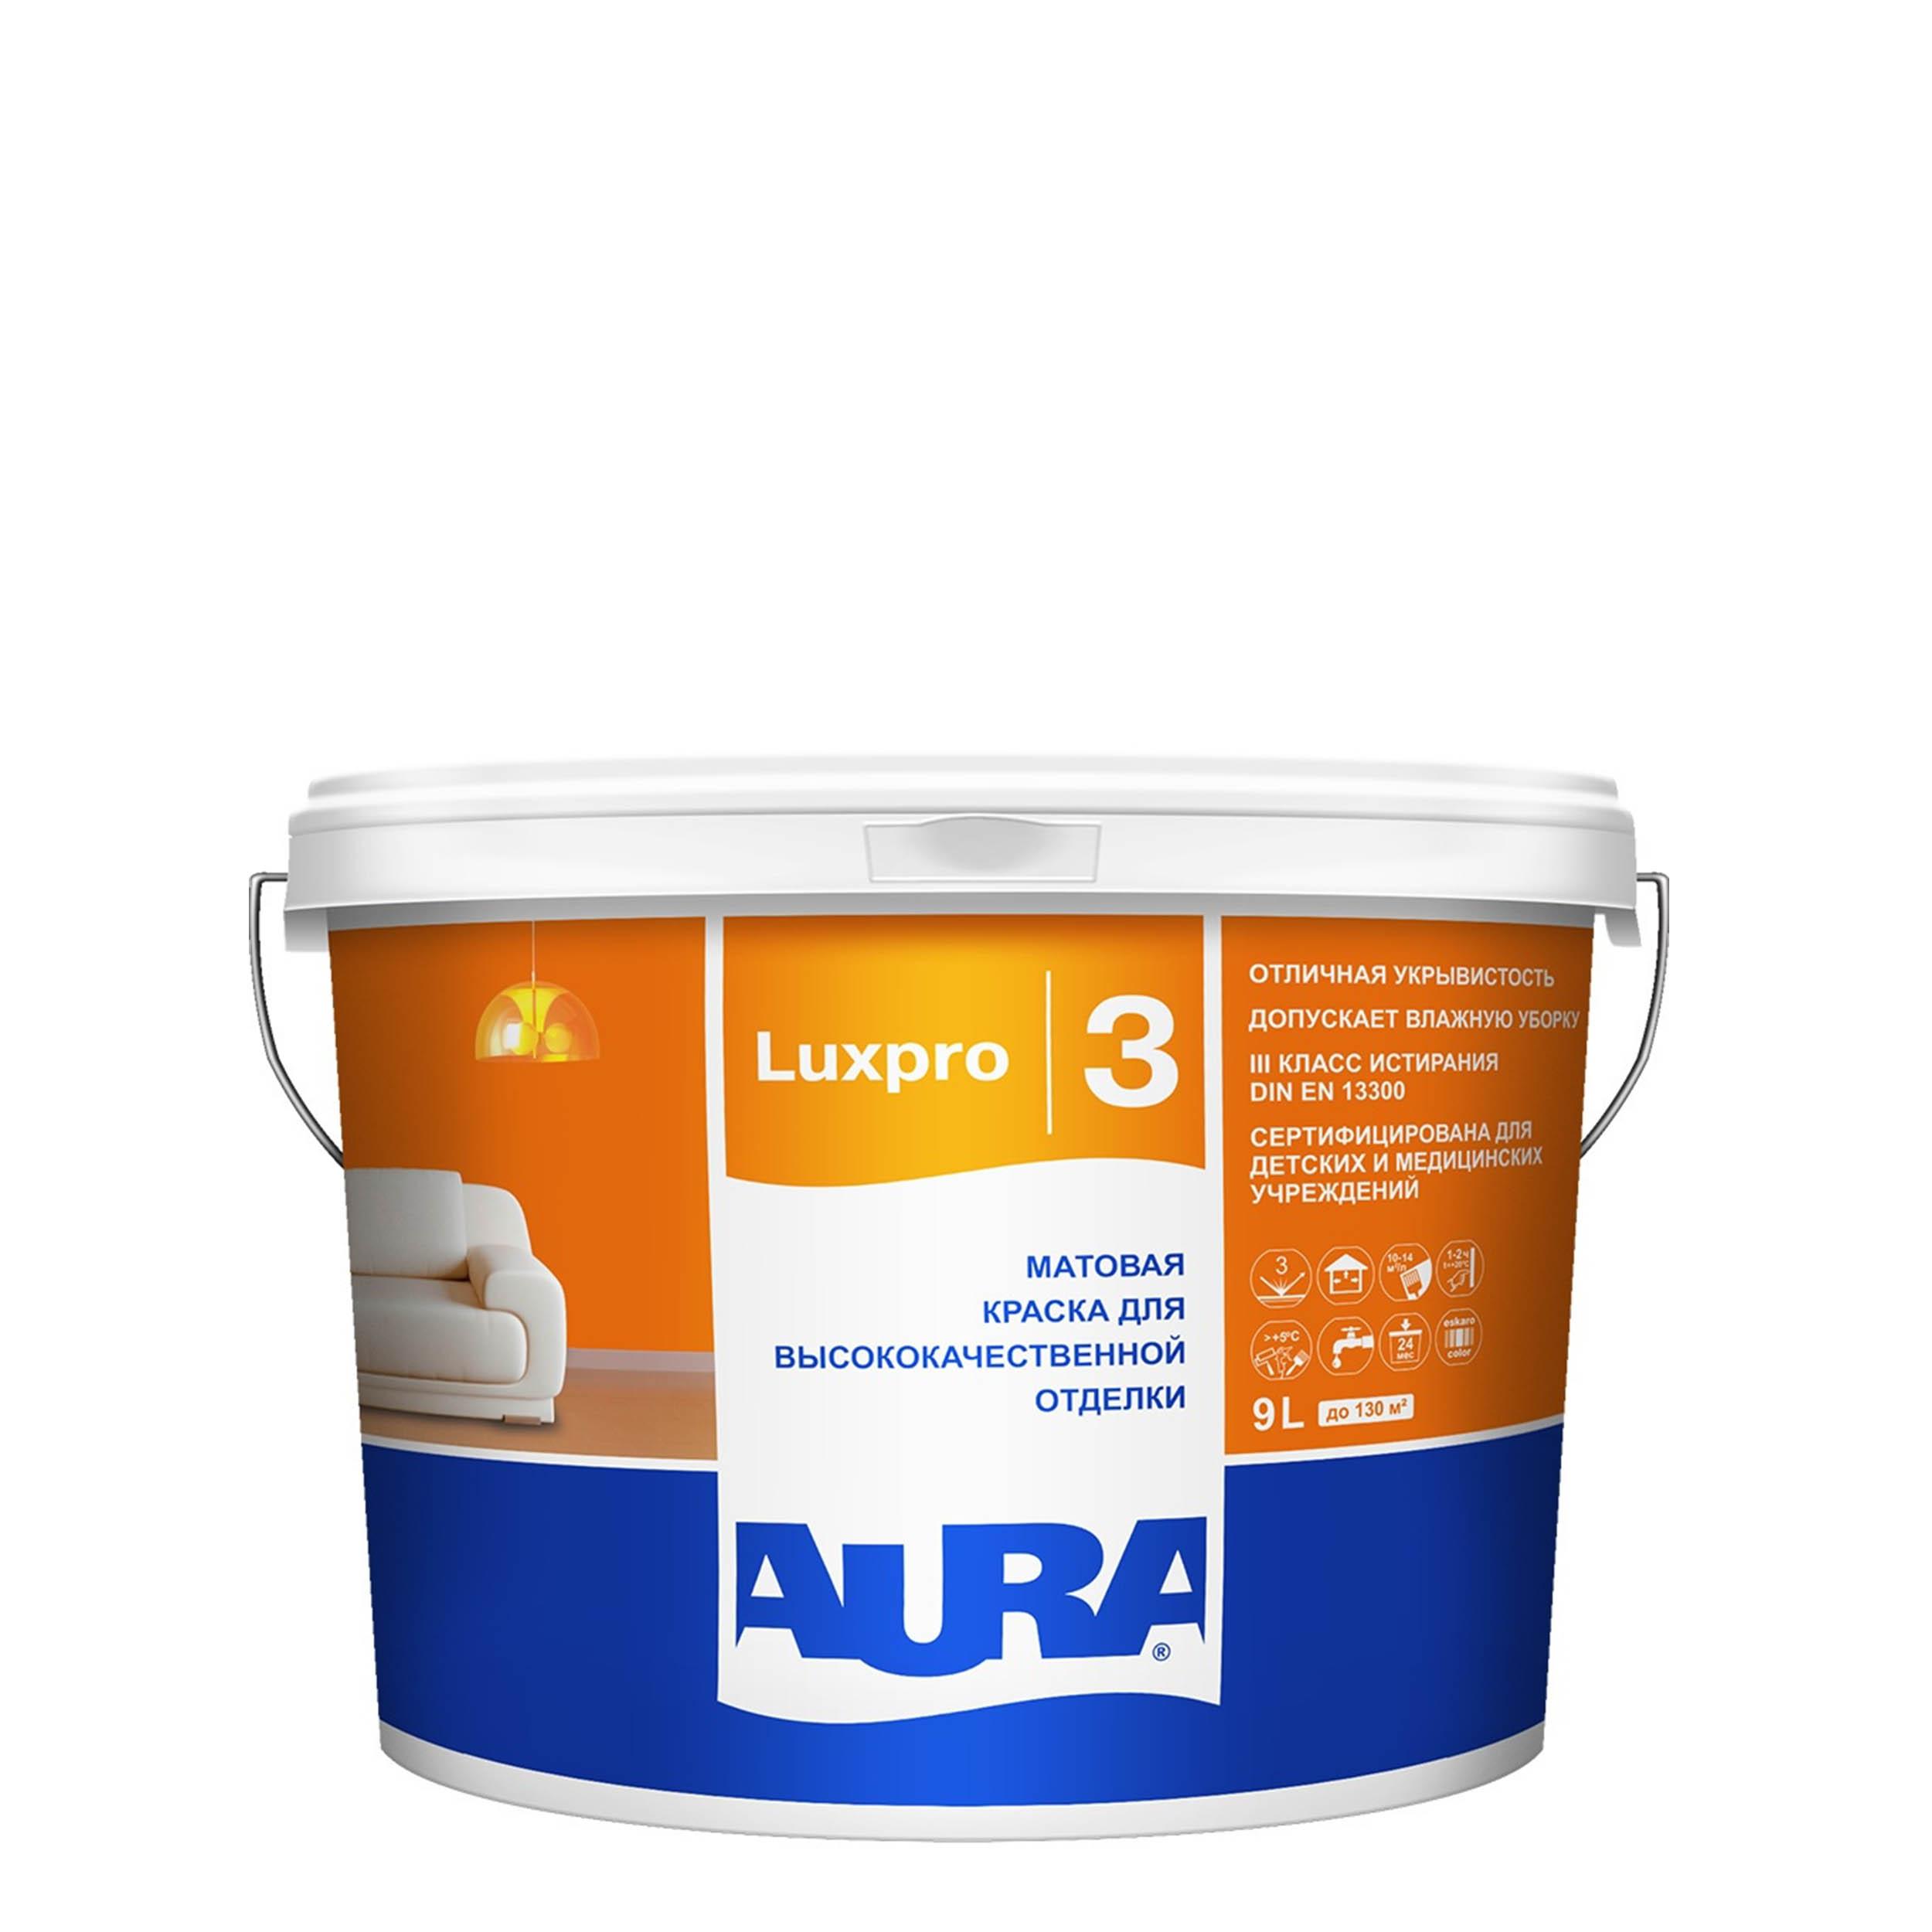 Фото 3 - Краска интерьерная, Aura LuxPRO 3, RAL 7021, 11 кг.